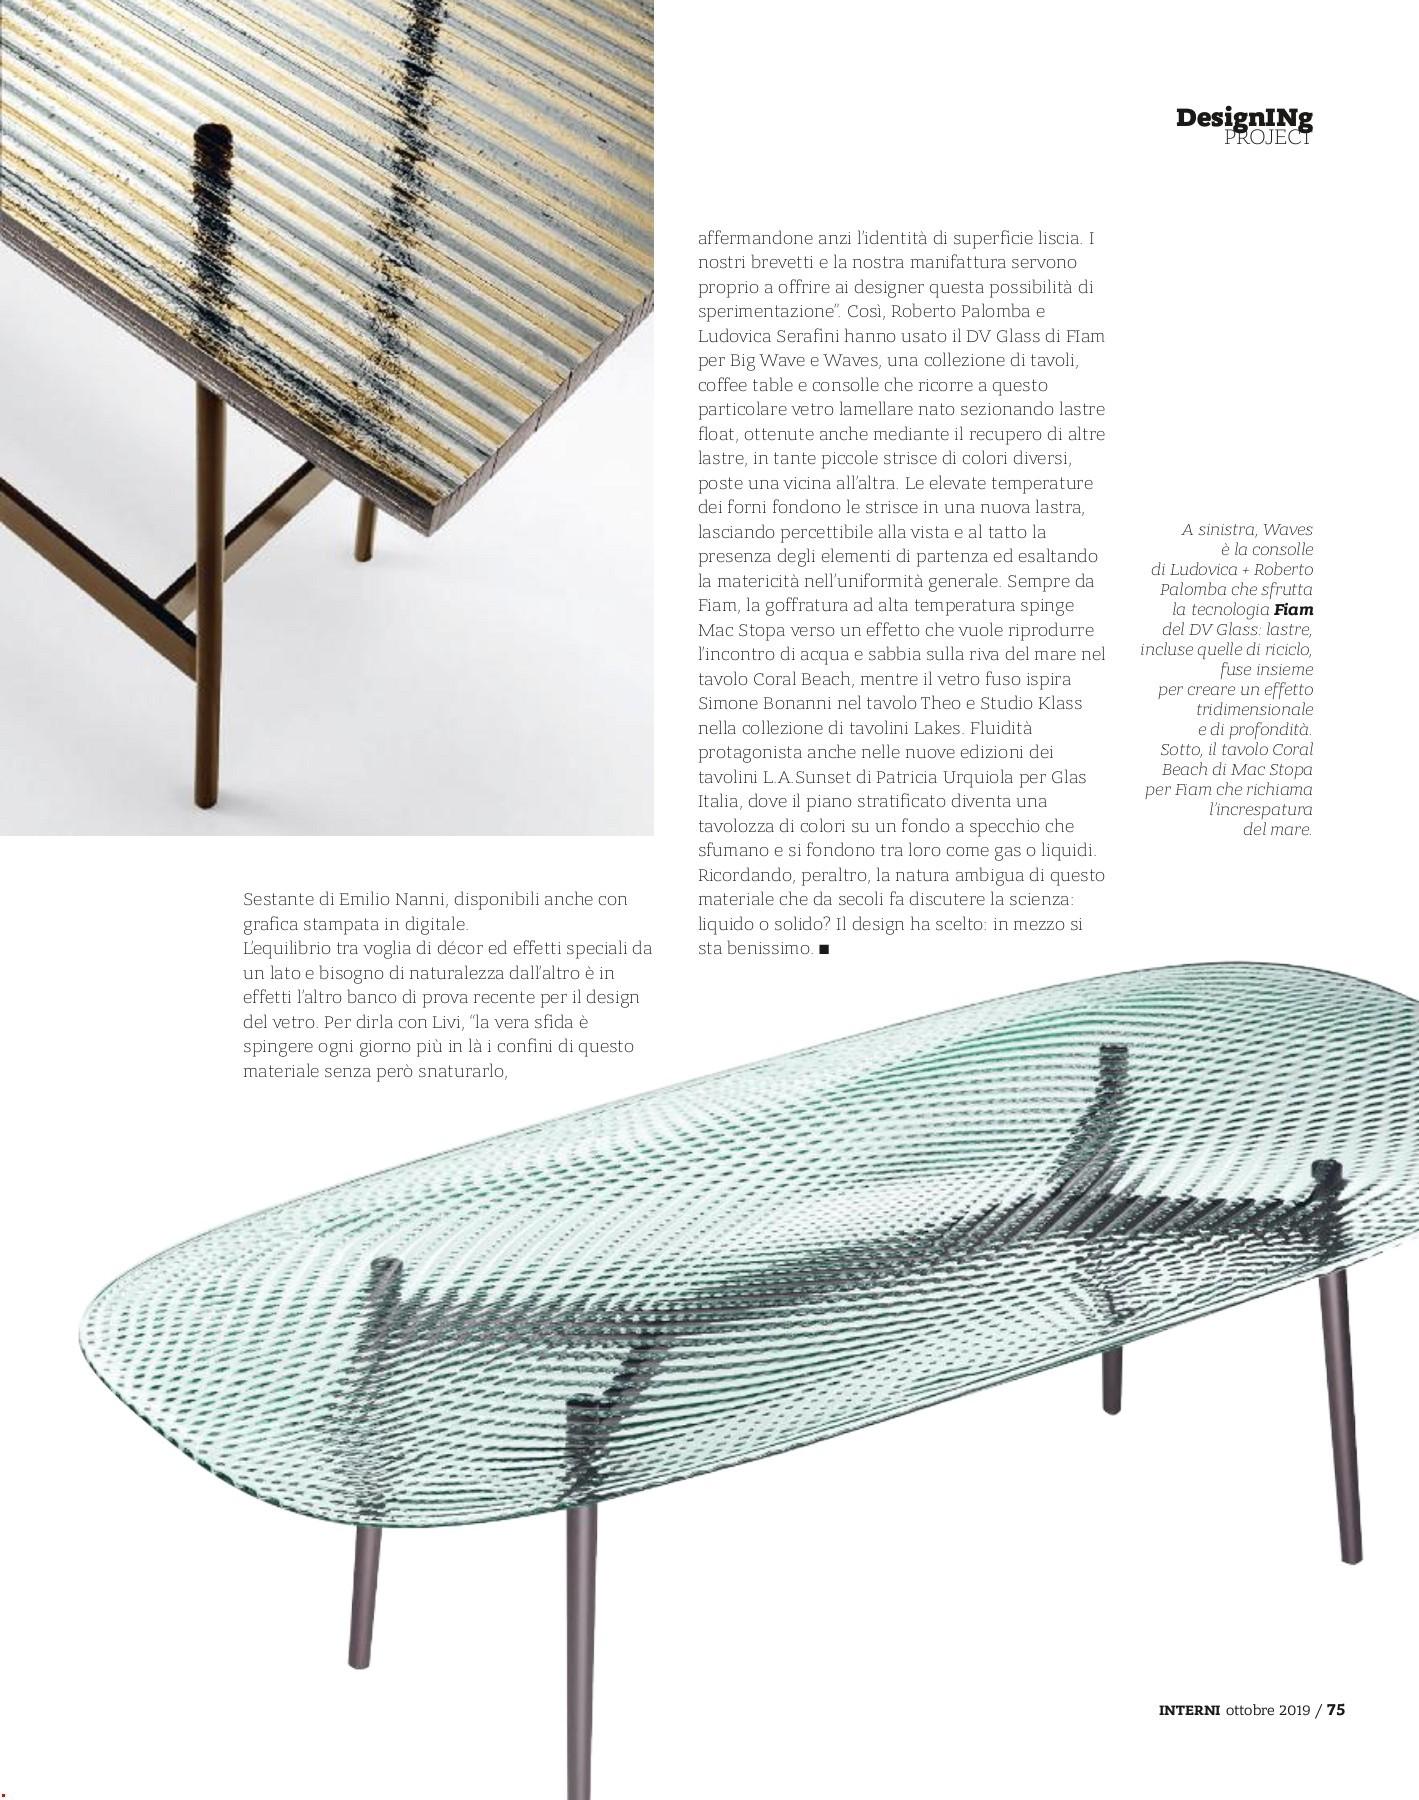 Cavalletti Per Quadri Ikea interni italia_oct 2019-flip book pages 201-250   pubhtml5